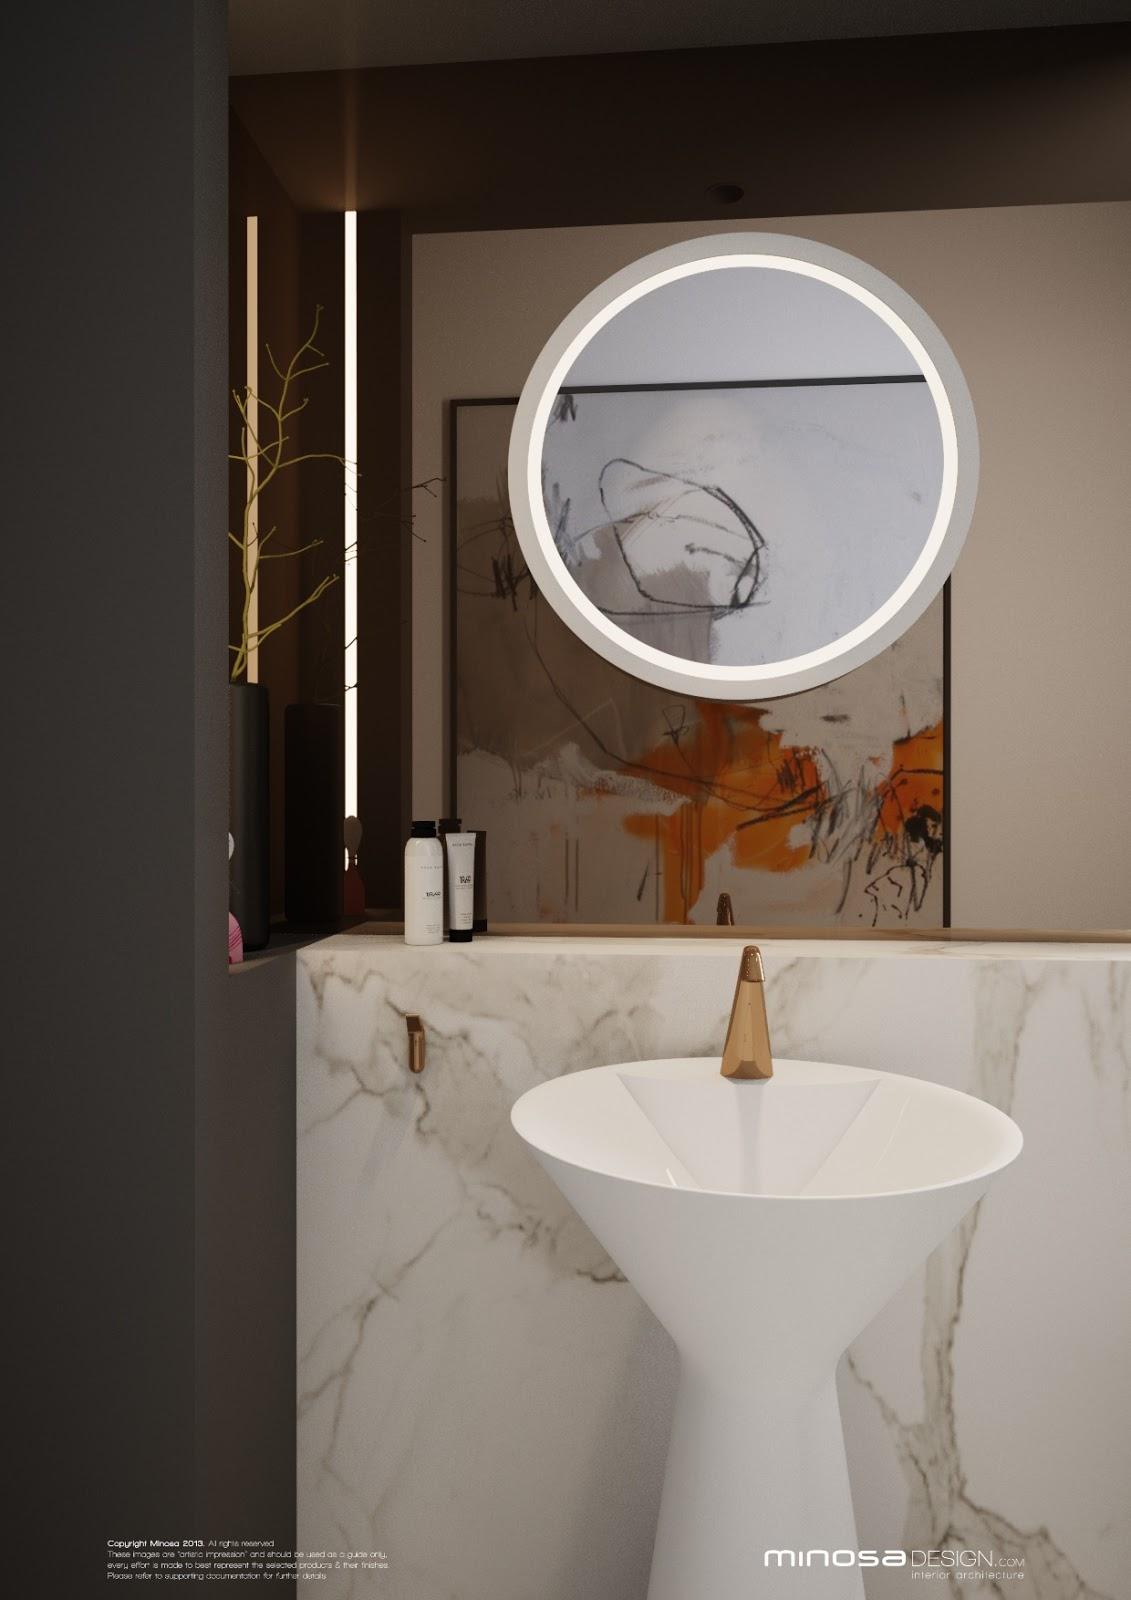 Minosa A Real Showstopper Modern Bathroom: Minosa: WOW Powder Room